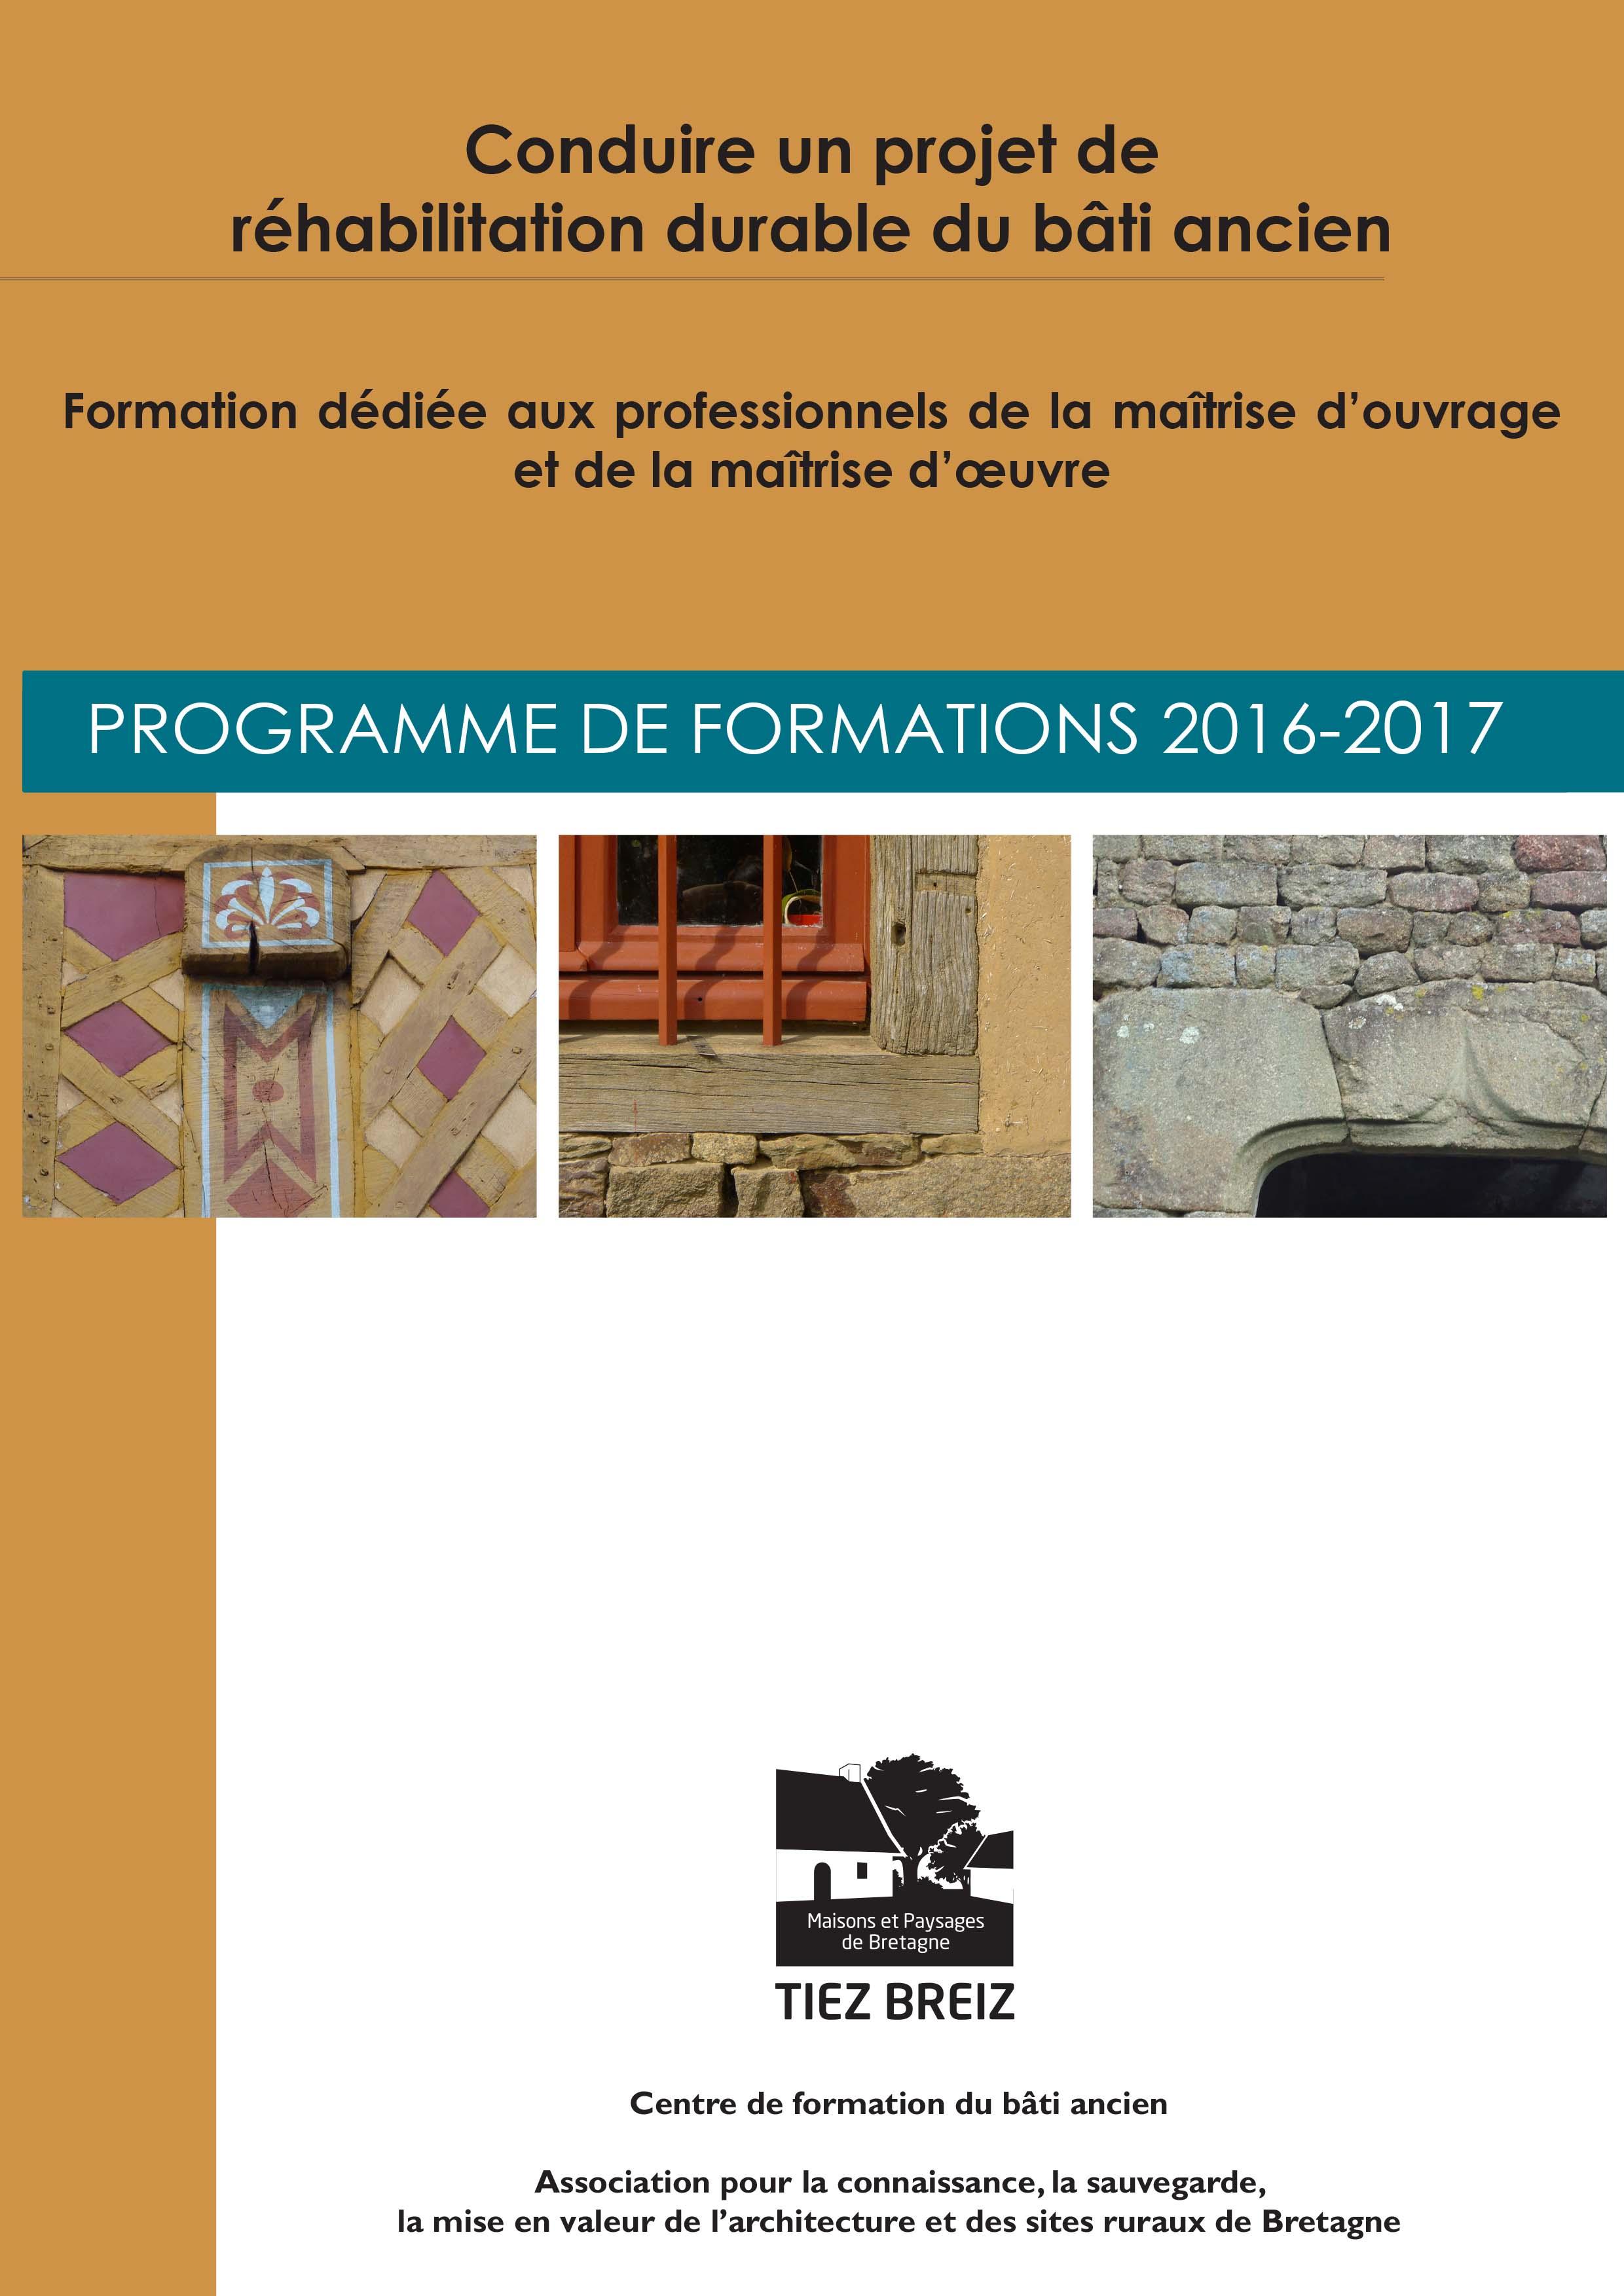 PROG_FORMATIONMO_2016-17-1-1